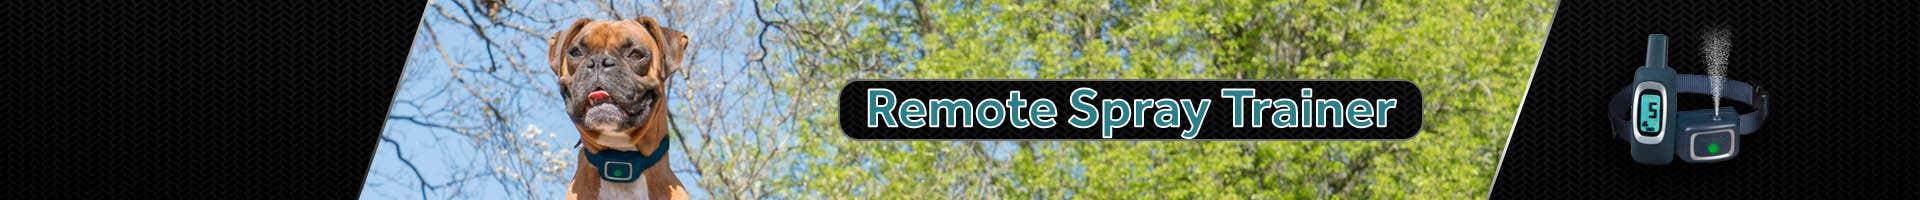 Remote Spray Trainers